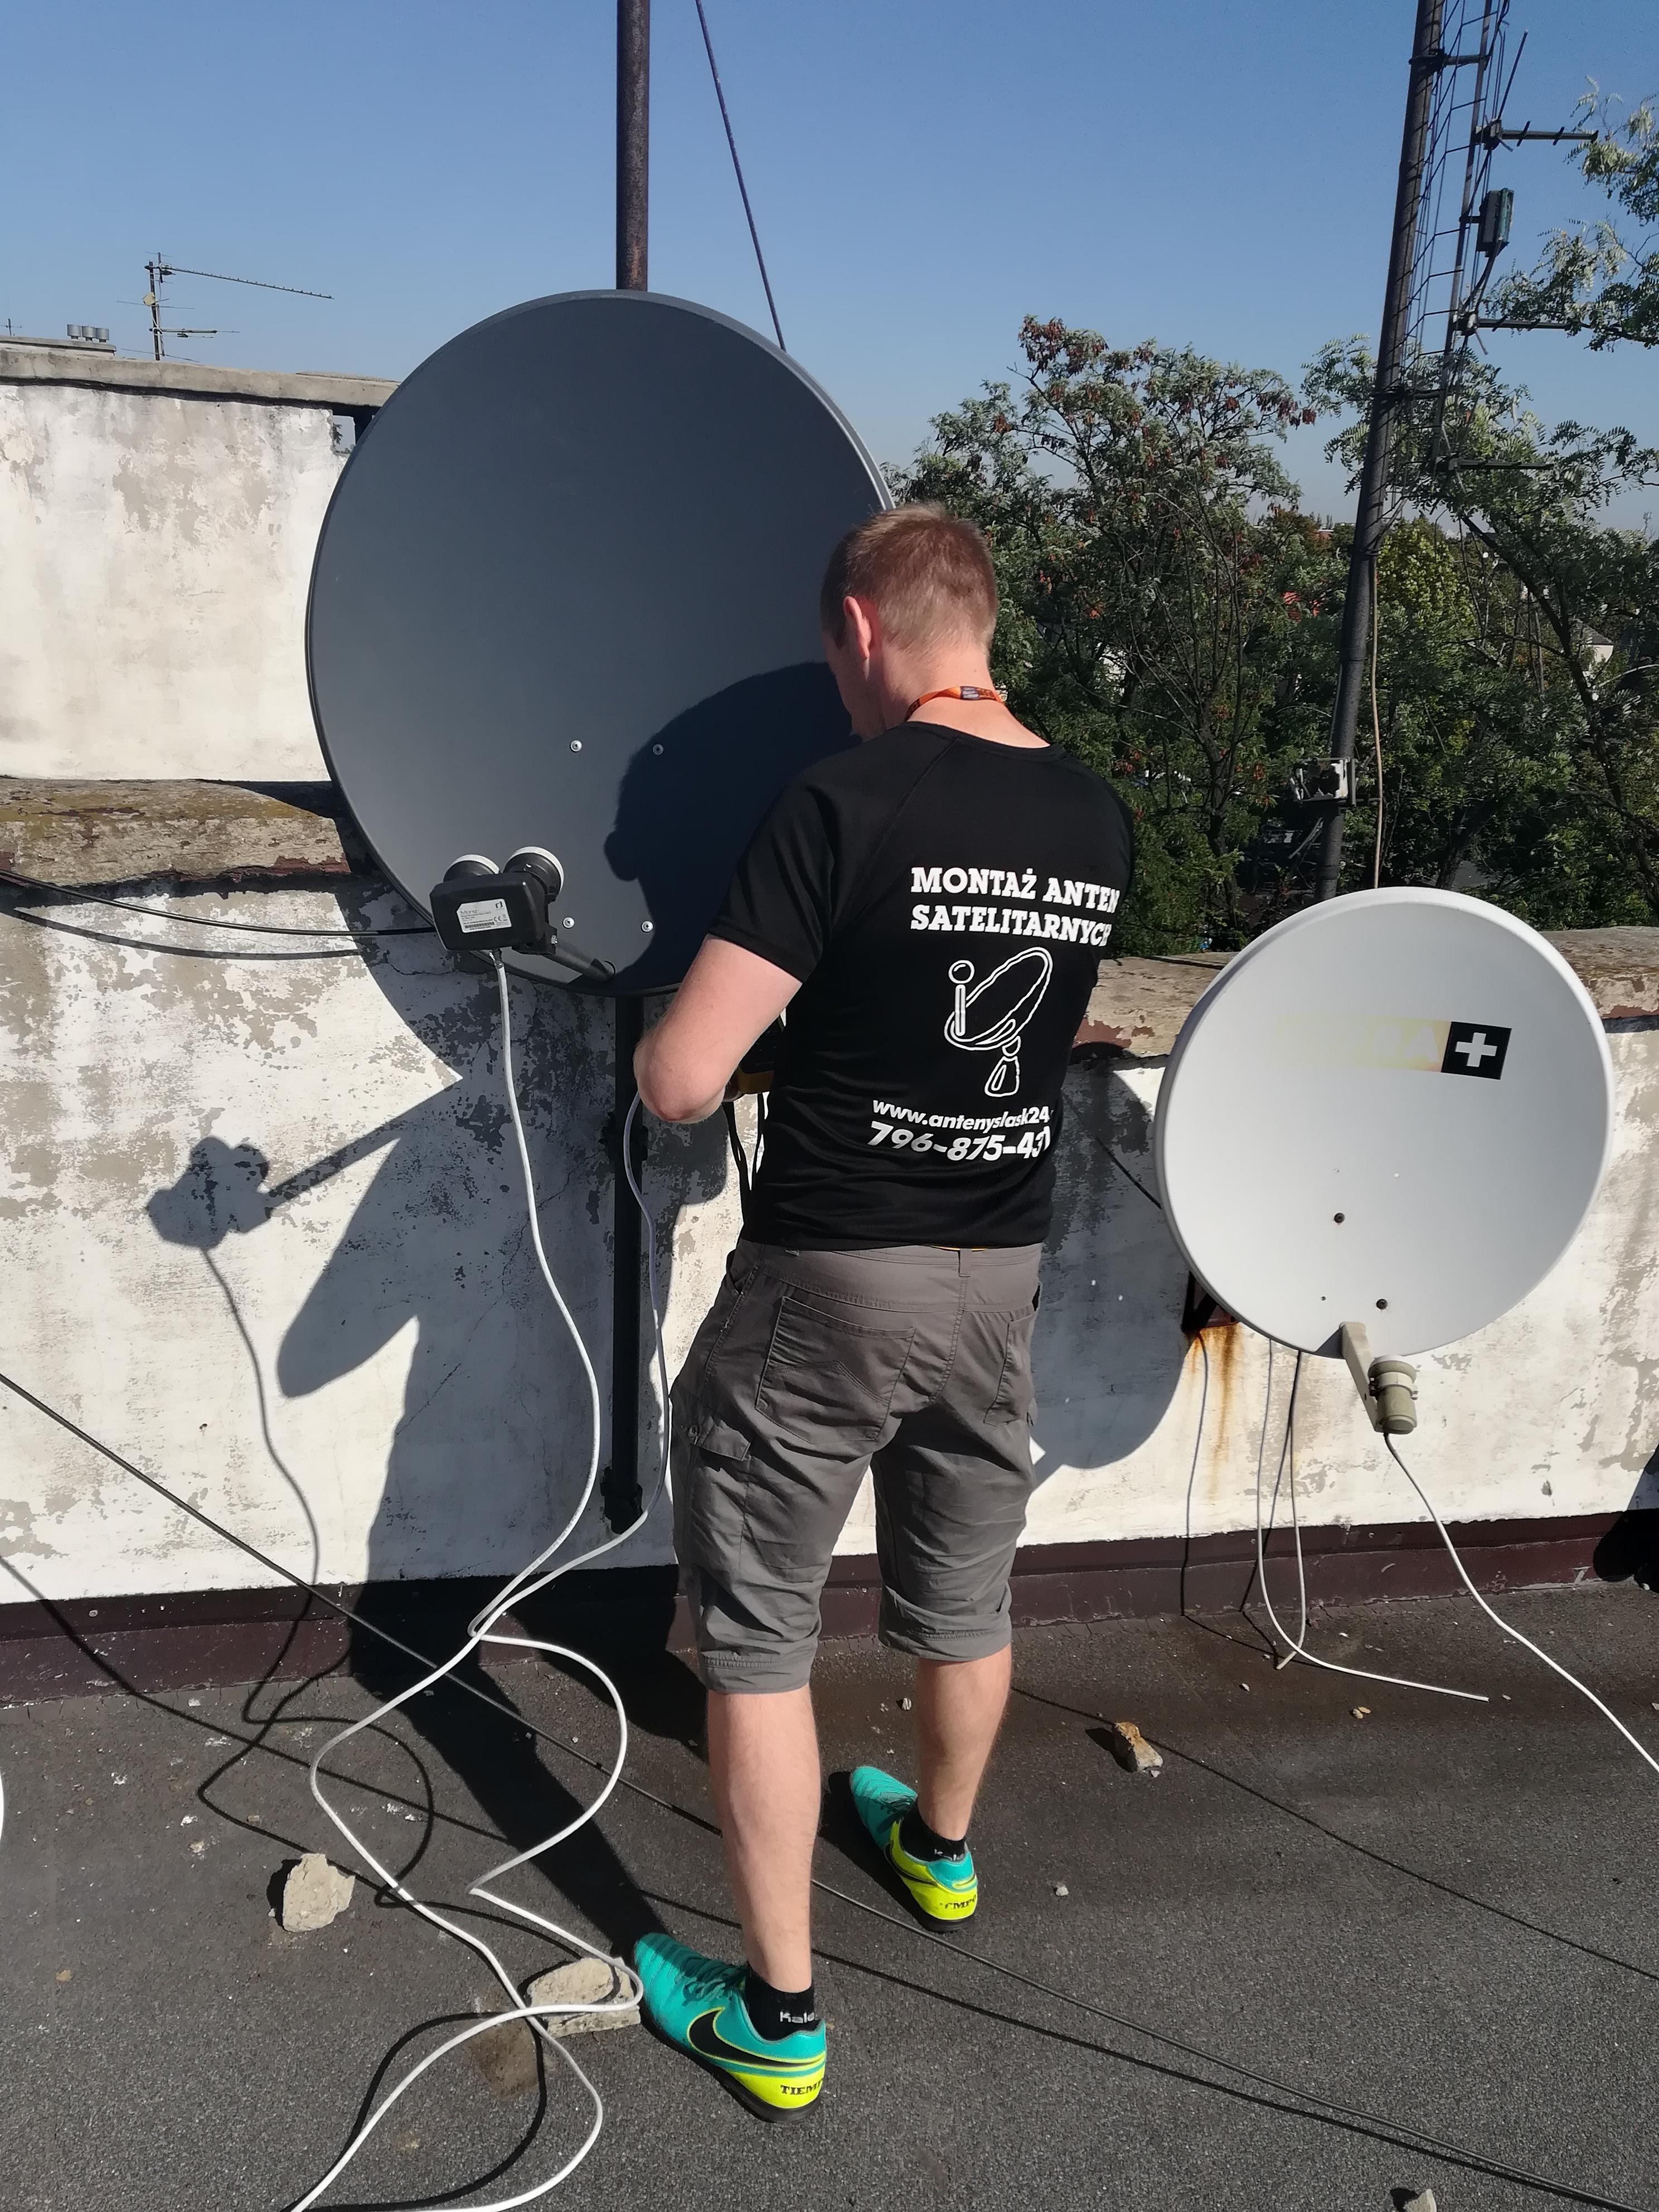 Antena Satelitarna Zabrze